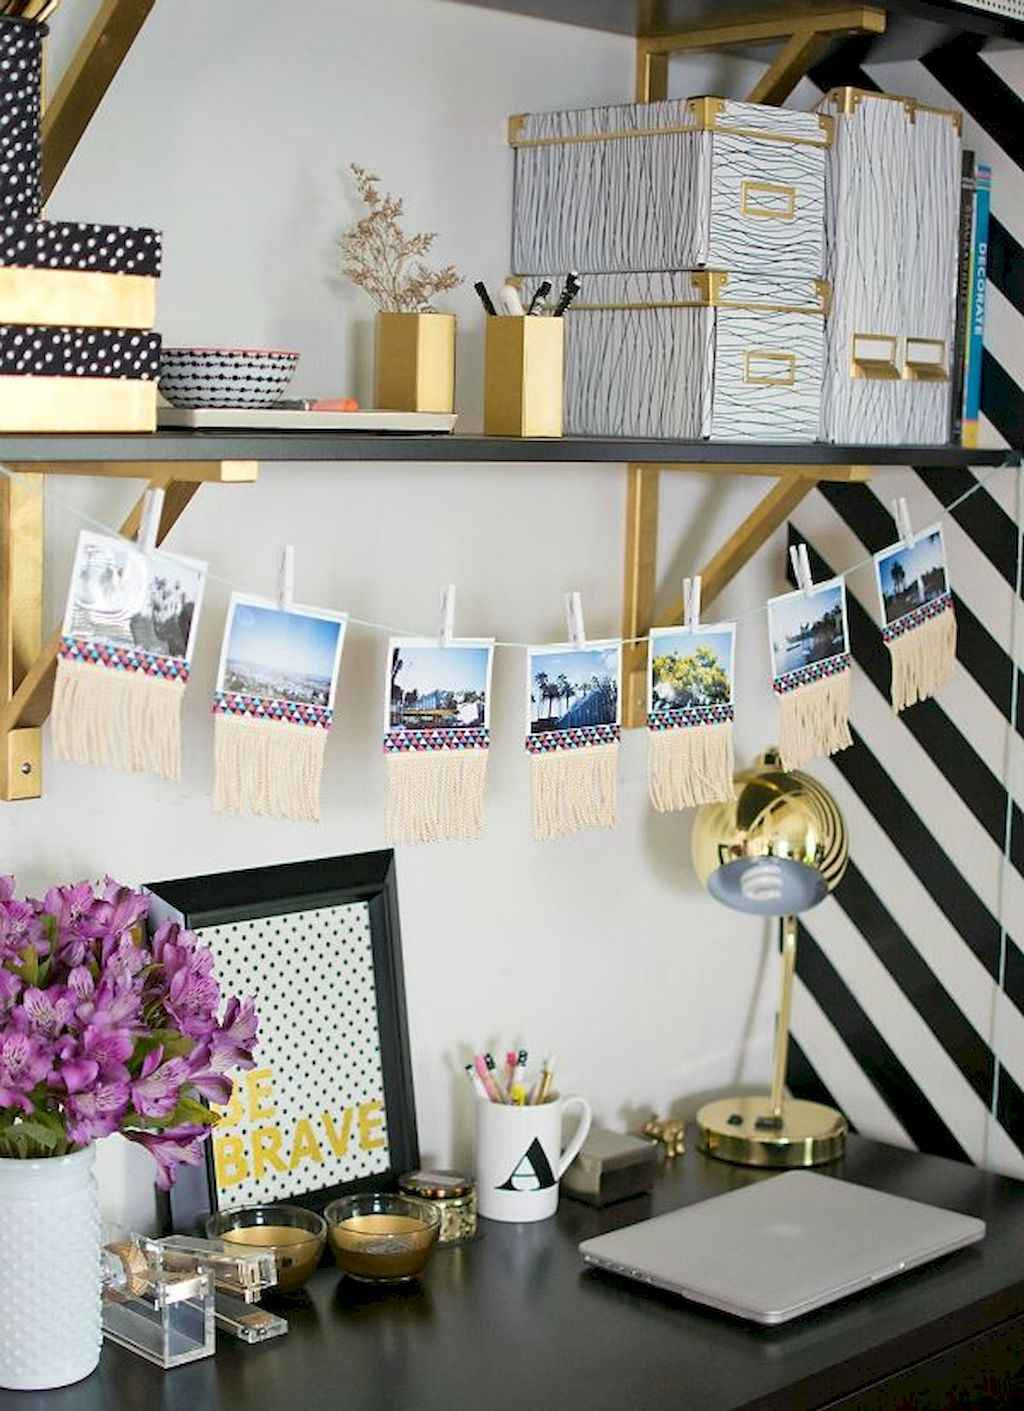 Cute diy dorm room decorating ideas on a budget (38)